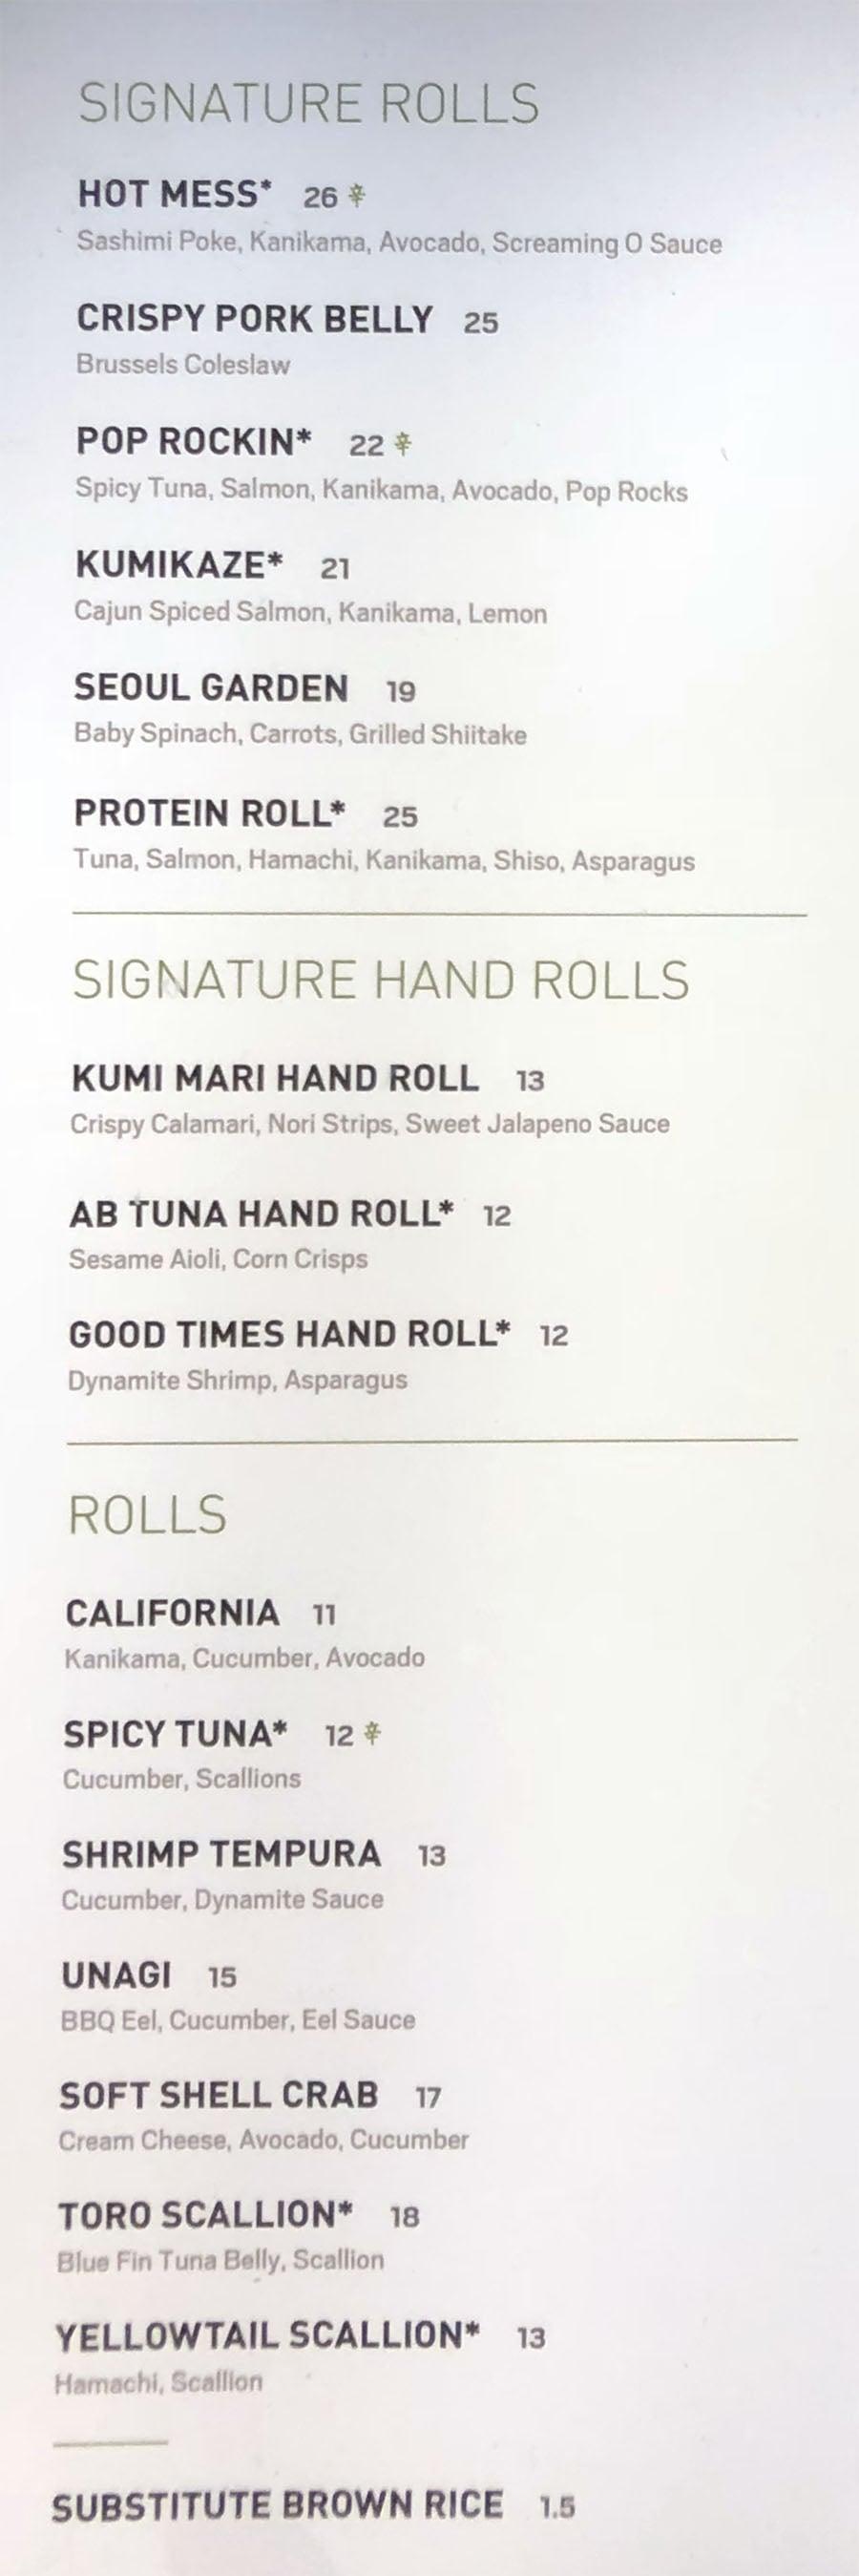 Kumi Japanese Restaurant menu - signature rolls, hand rolls, rolls